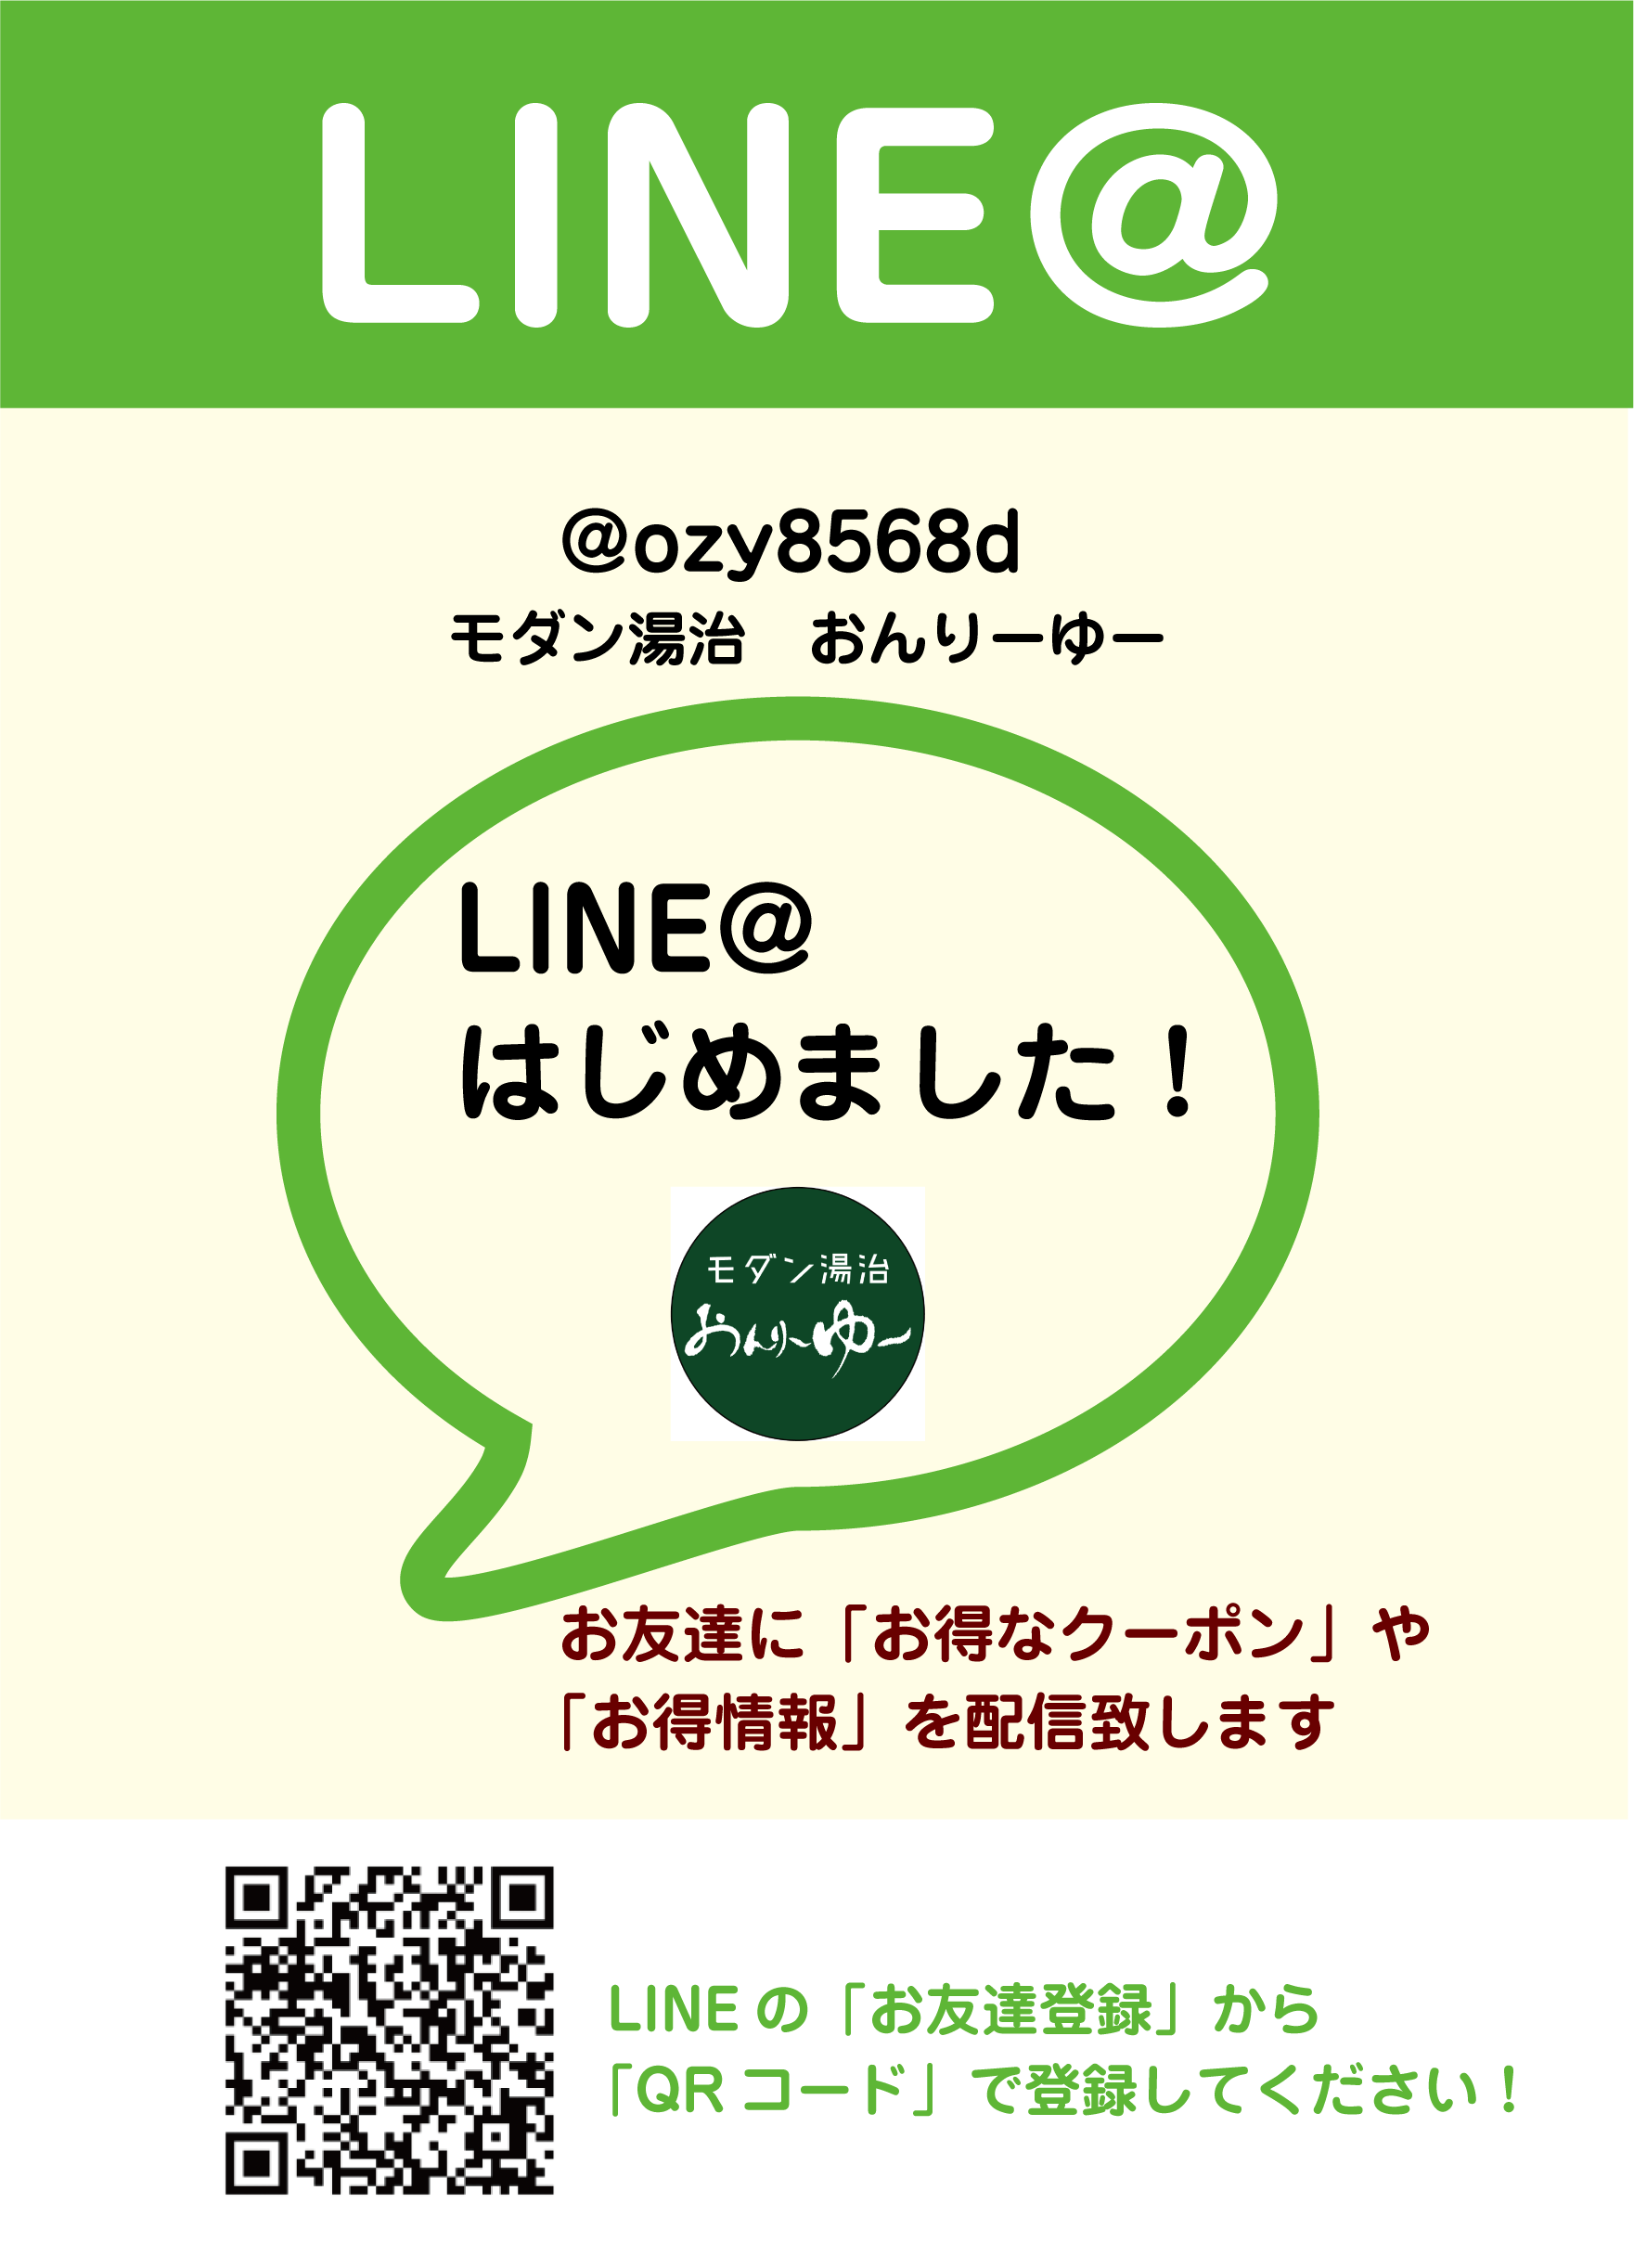 LINE@を始めました!